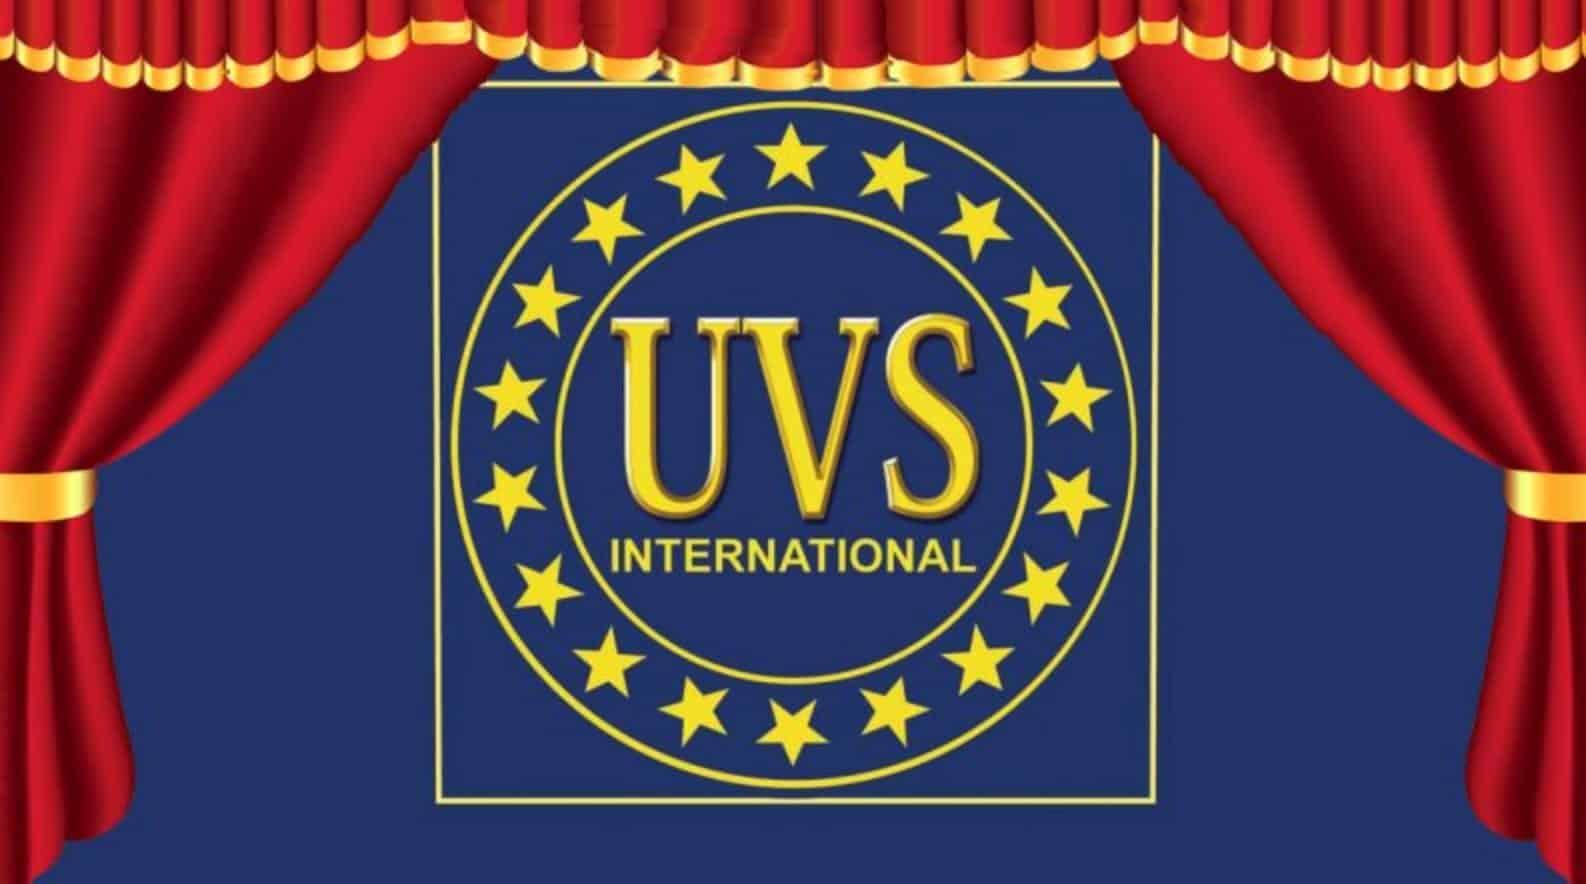 UVS International